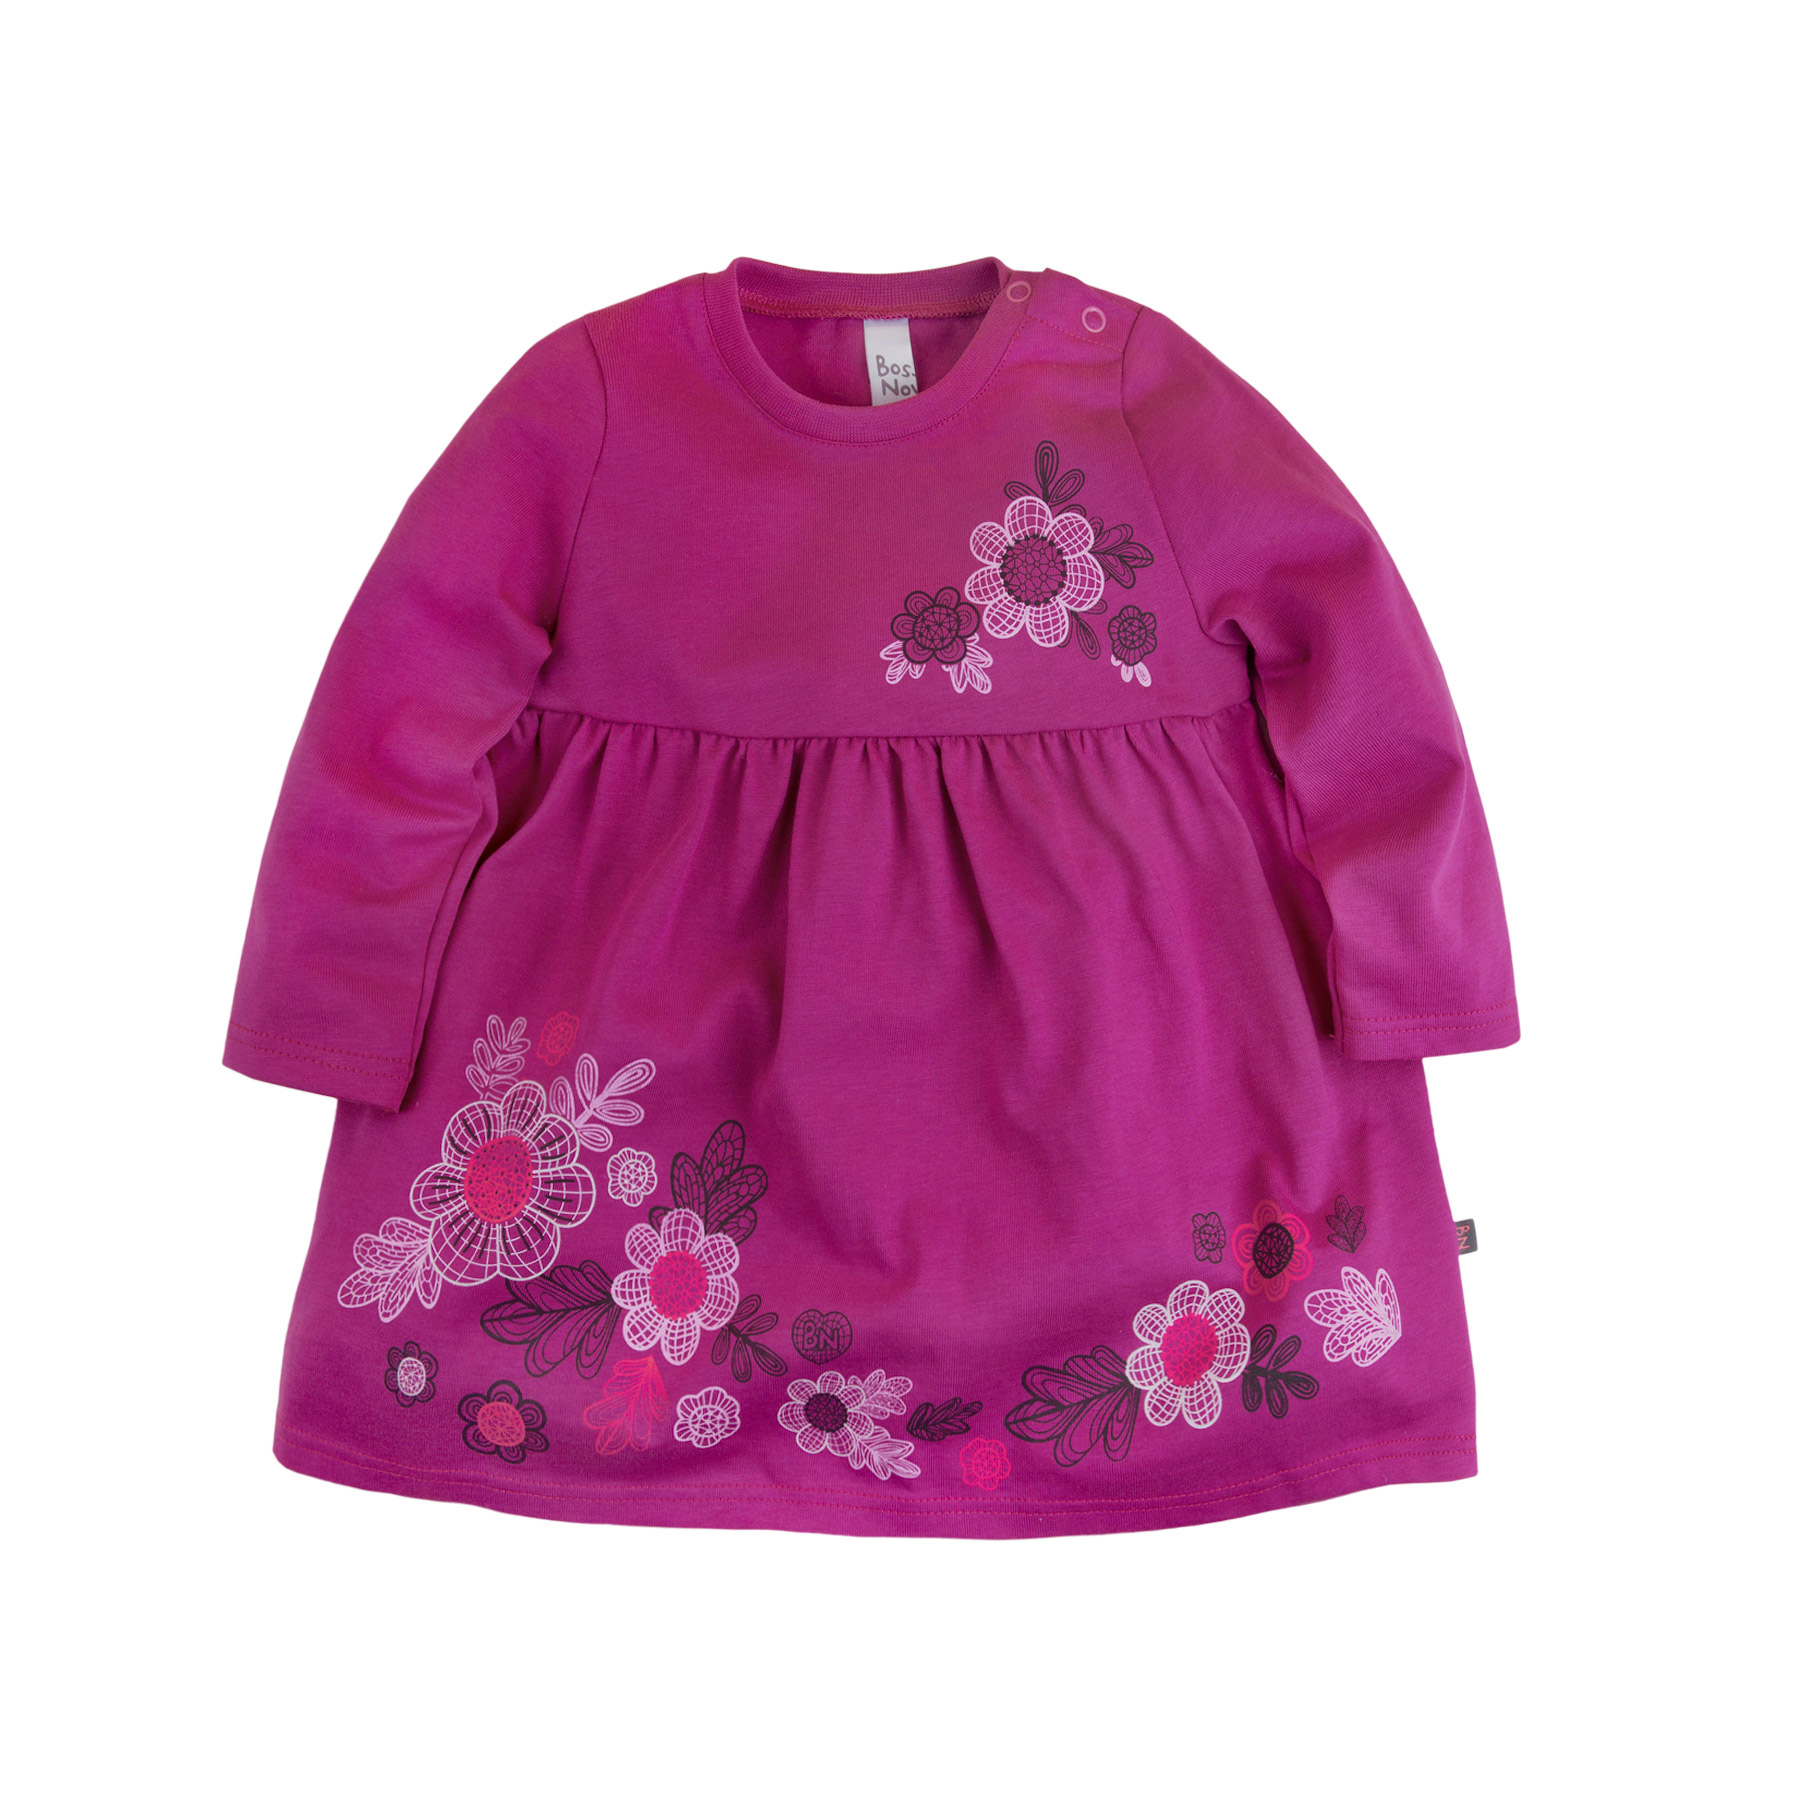 Dress for girls Bossa Nova 135B-161f girls tie neck polka dot dress